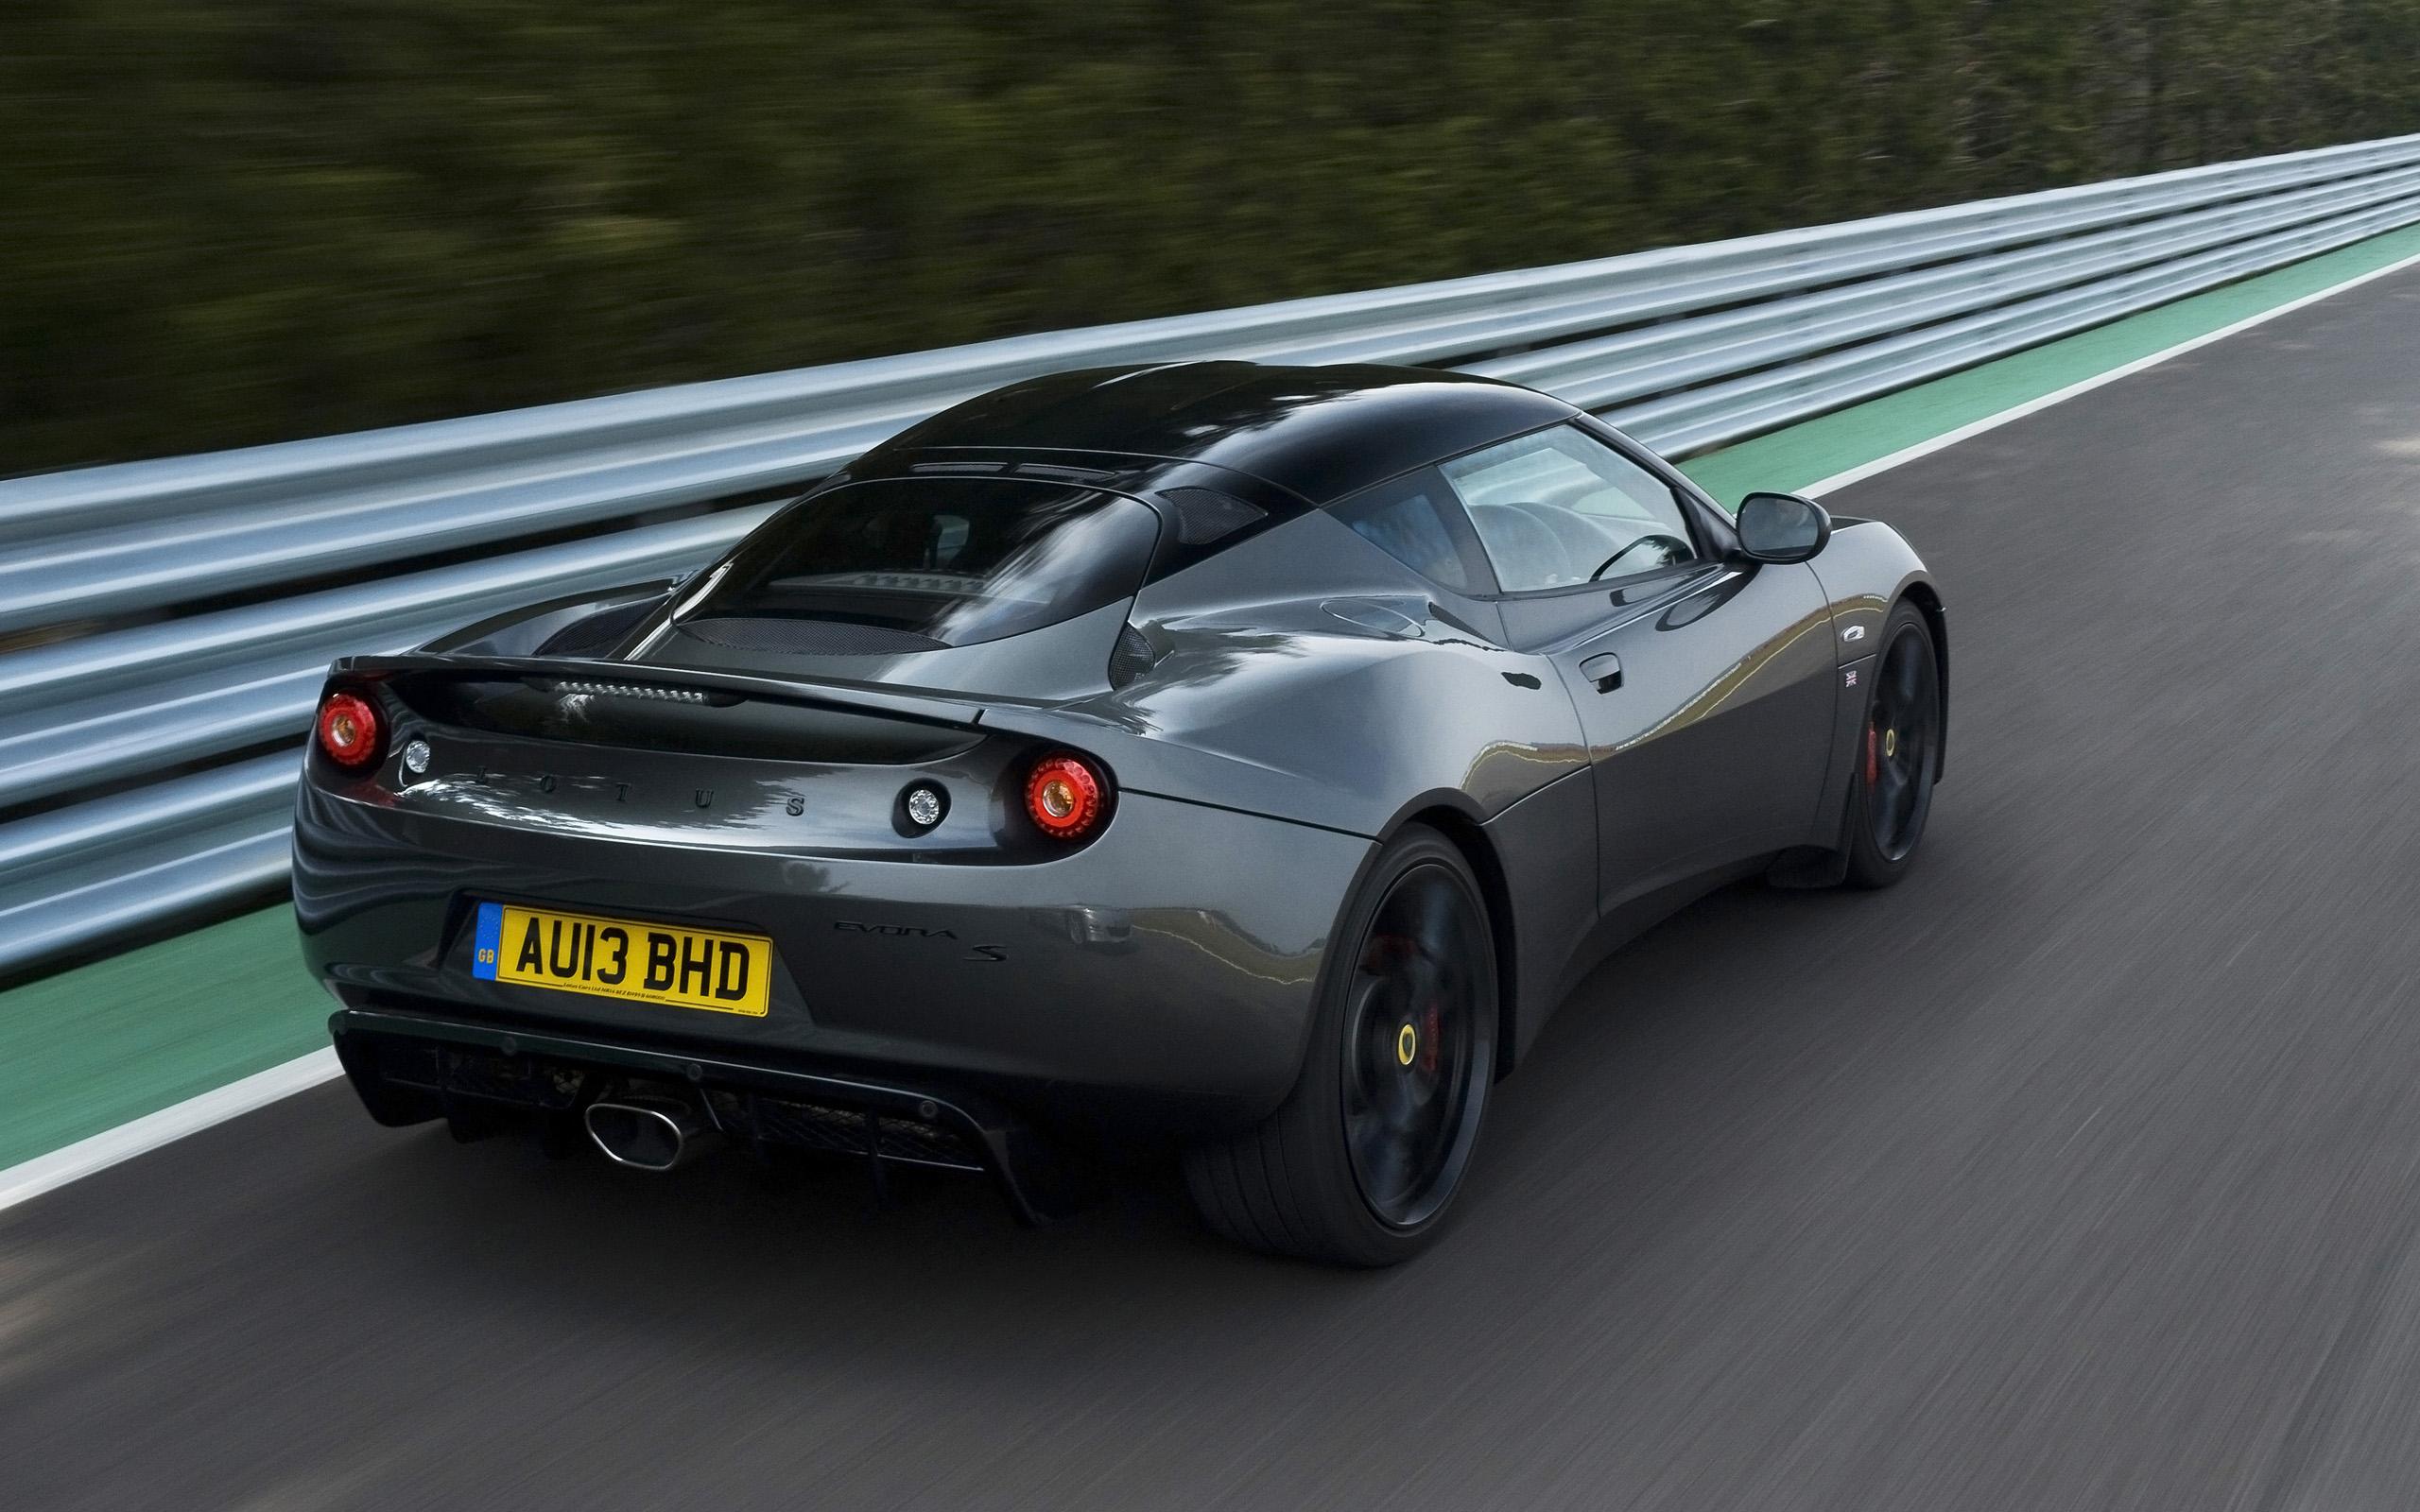 Lotus evora sr 2+2 2013-Lotus-Evora-Sports-Racer-Carbon-Grey-Motion-11-2560x1600